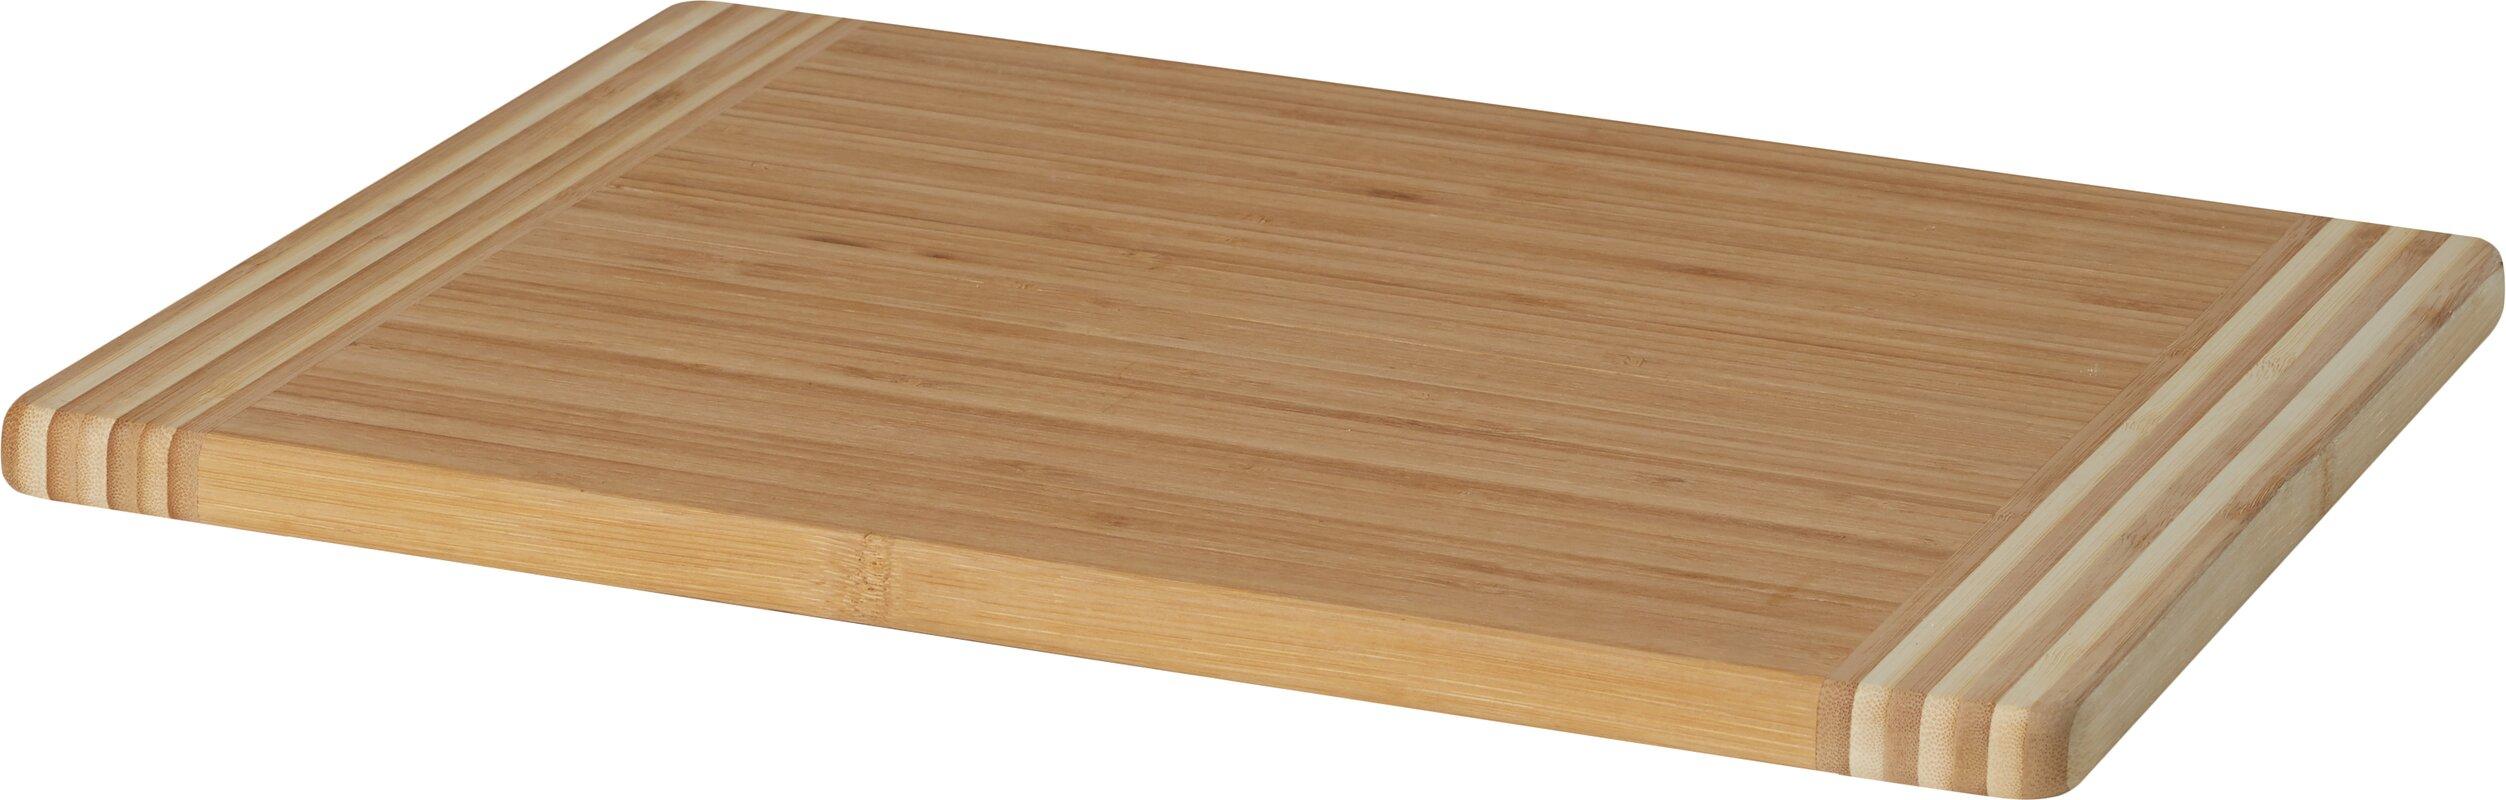 zeller schneidebrett aus bambus bewertungen. Black Bedroom Furniture Sets. Home Design Ideas